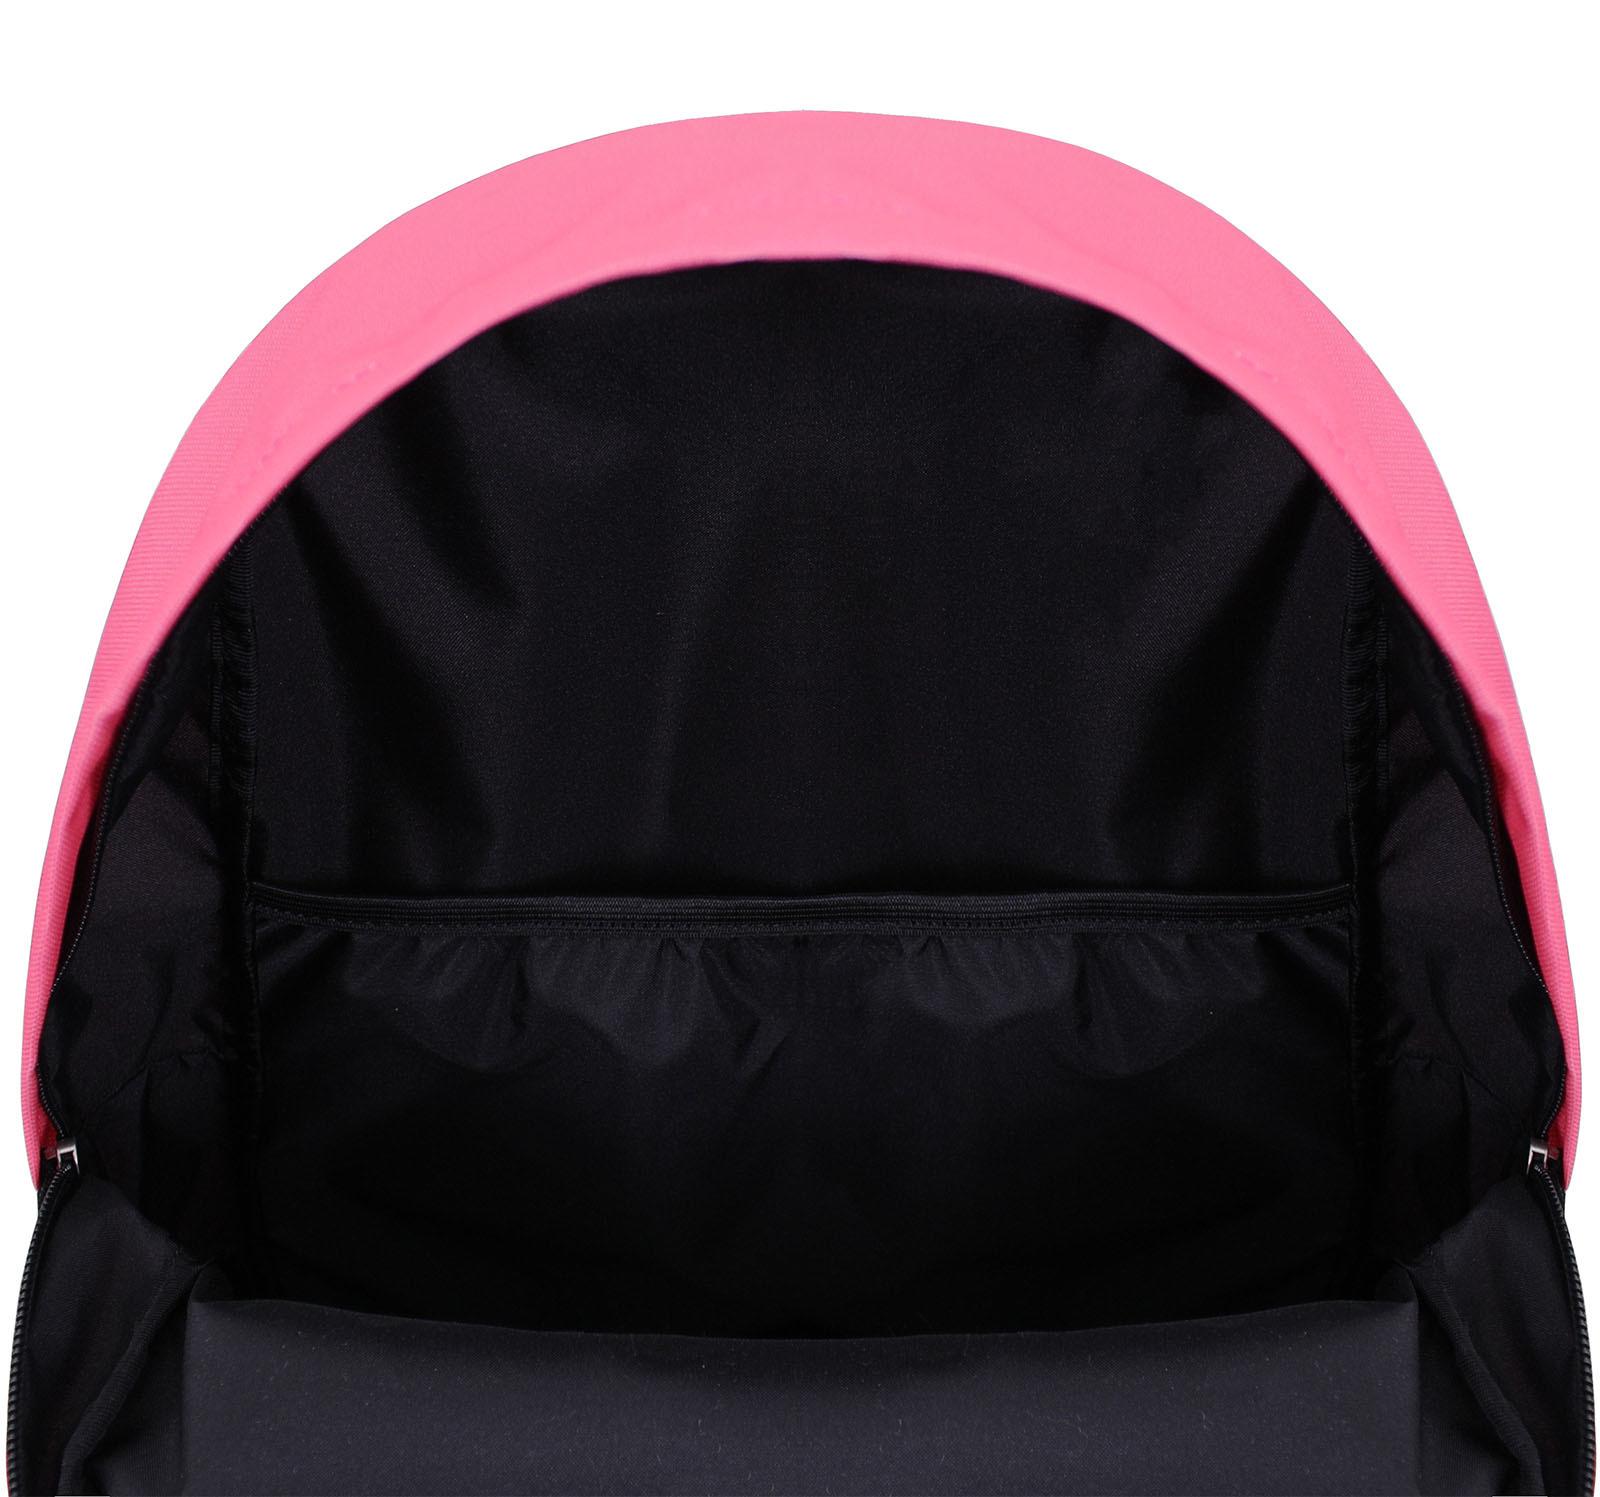 Рюкзак Bagland Молодежный W/R 17 л. Розовый (00533664 Ш) фото 8